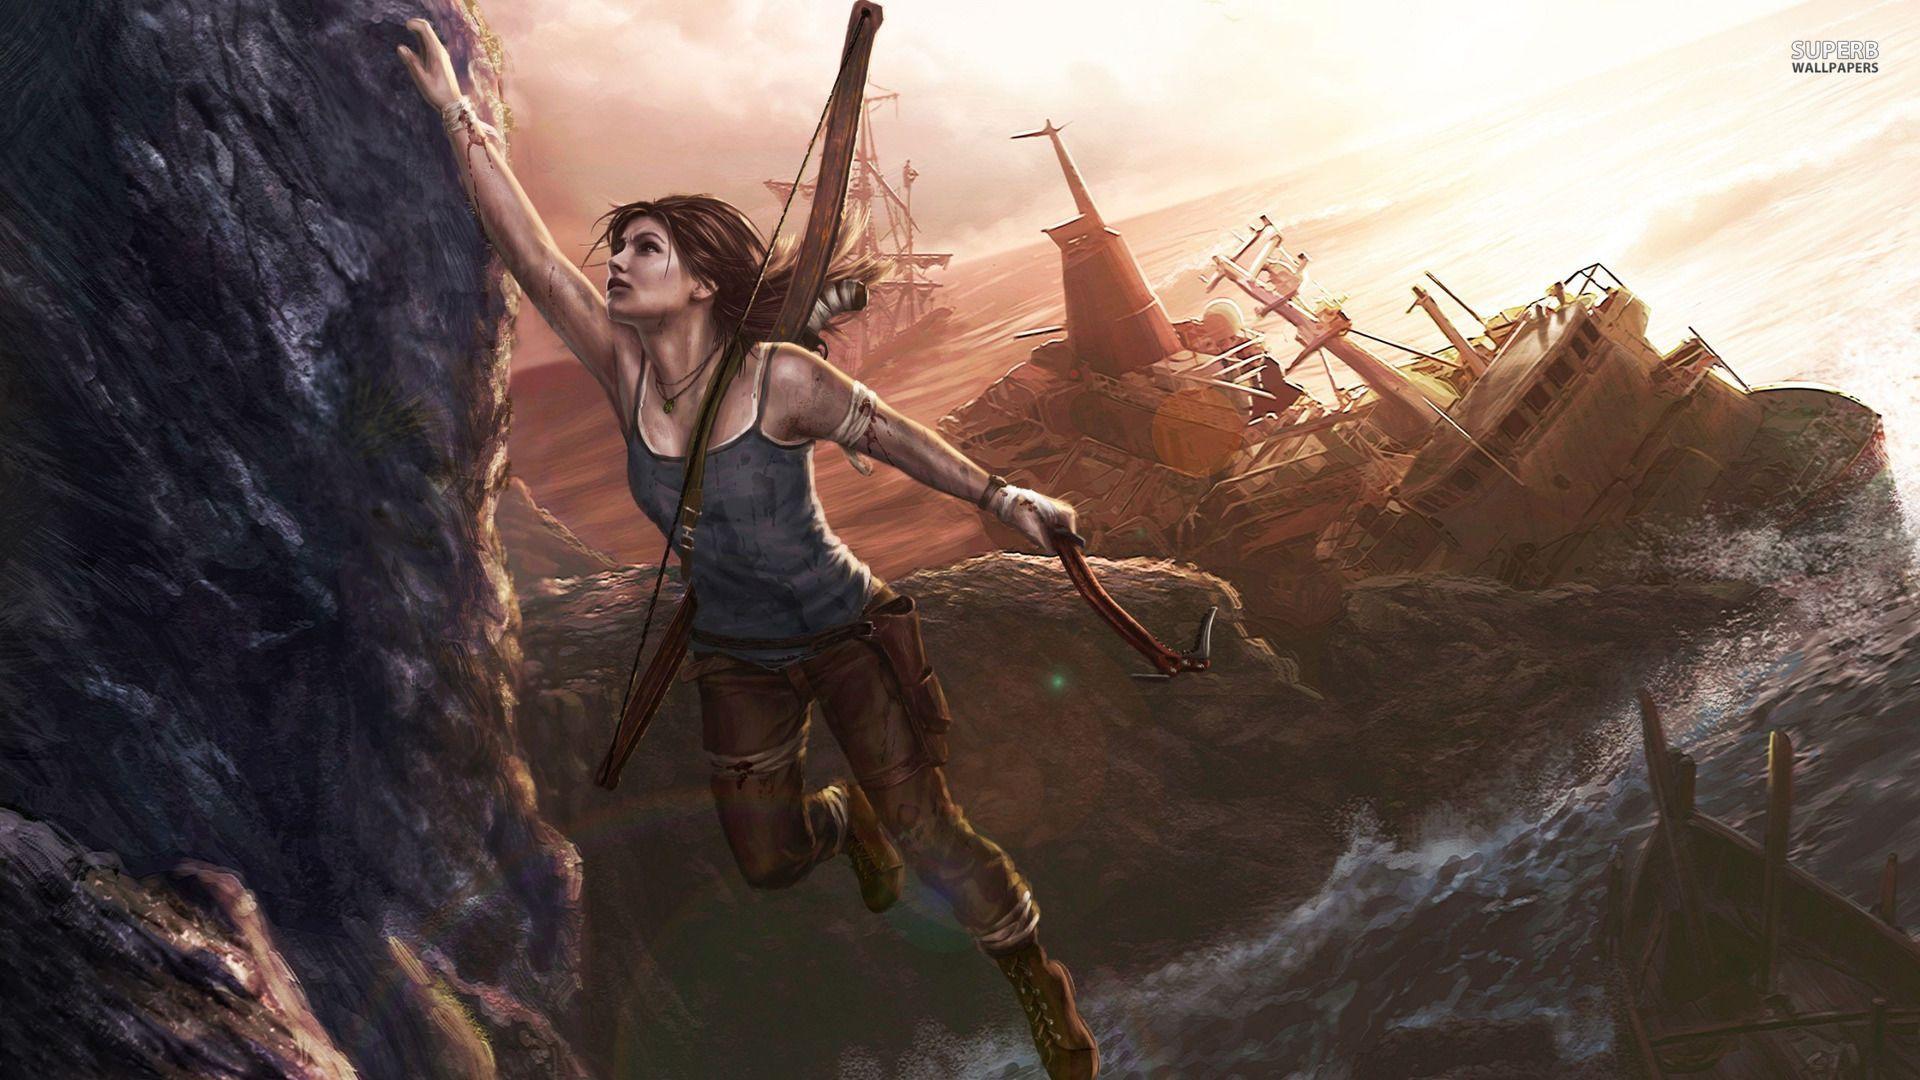 Lara Croft Tomb Raider Background Gallery 530293844